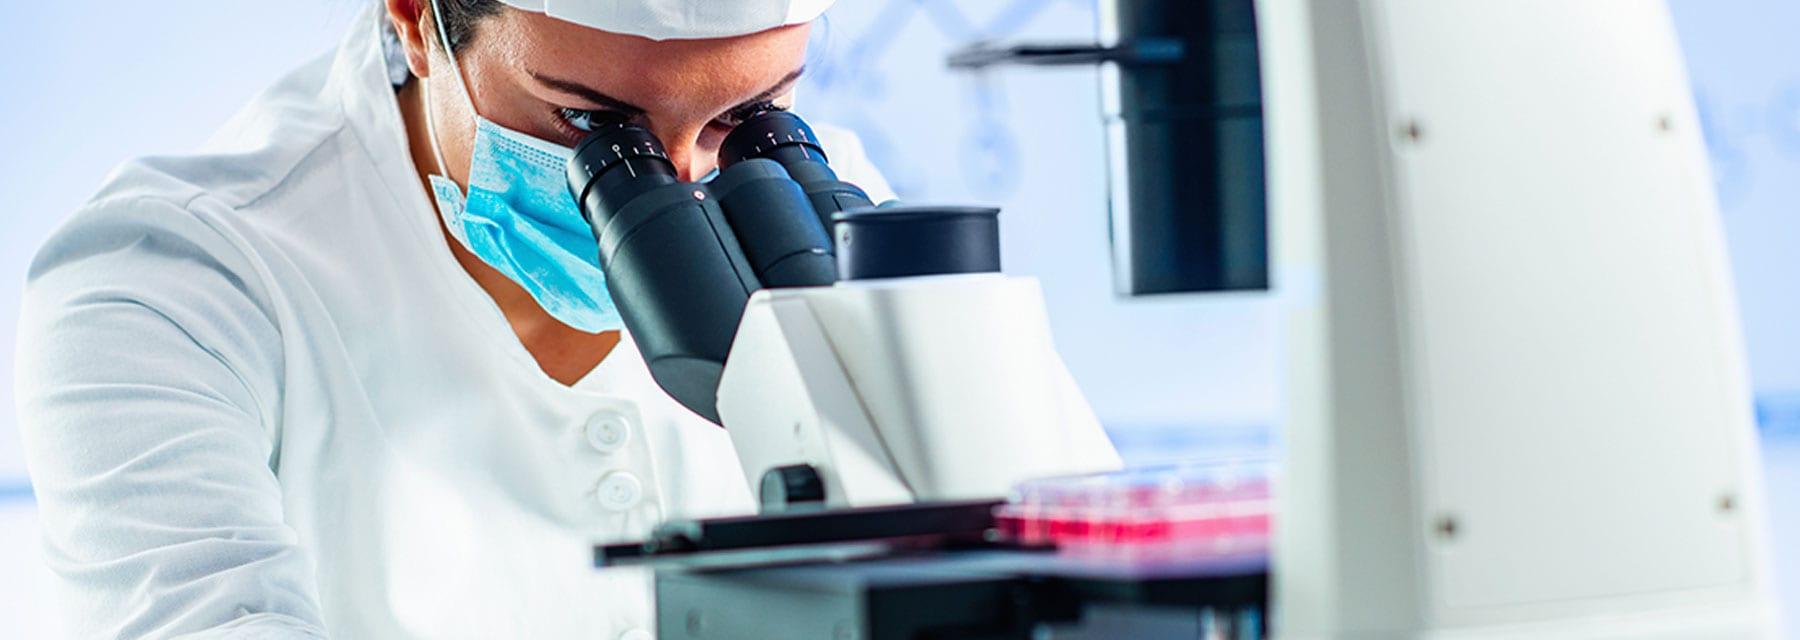 sueldo como biólogo molecular